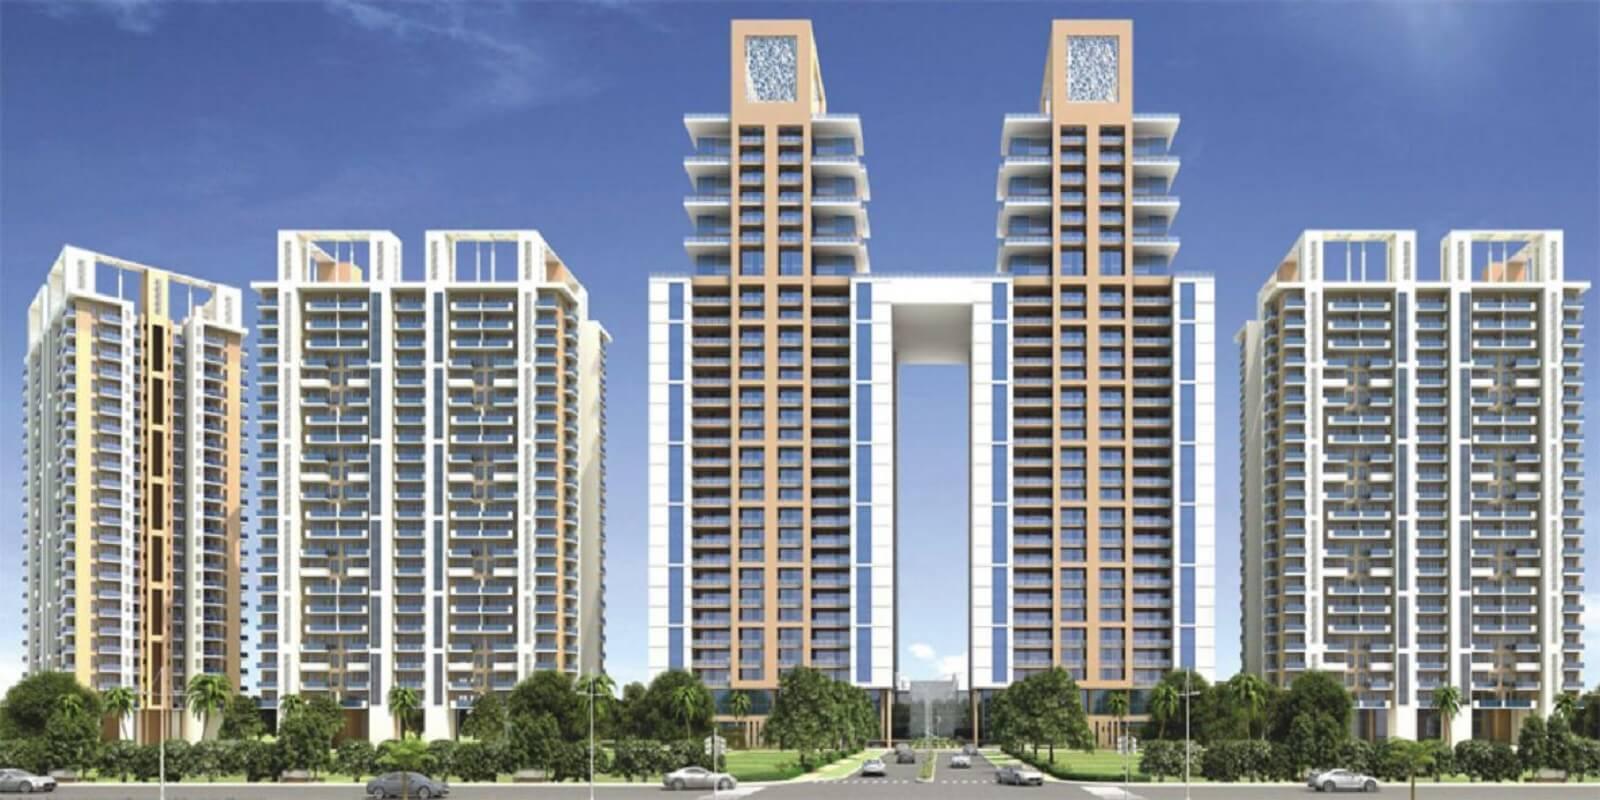 gaur city 2 16th avenue project large image1